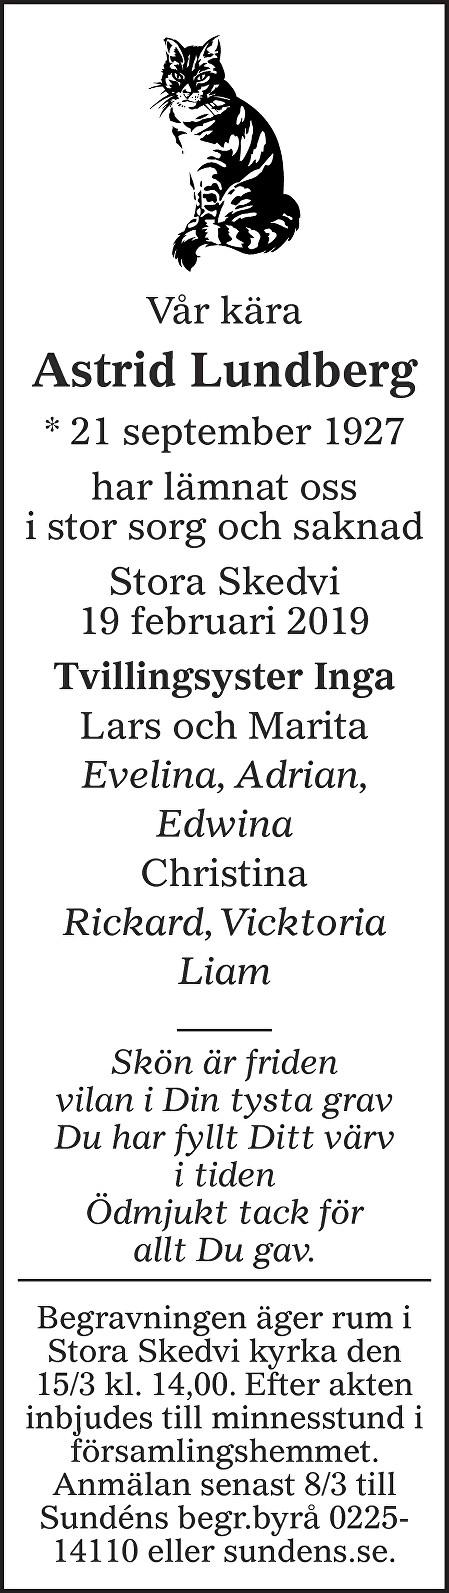 Astrid Lundberg Death notice